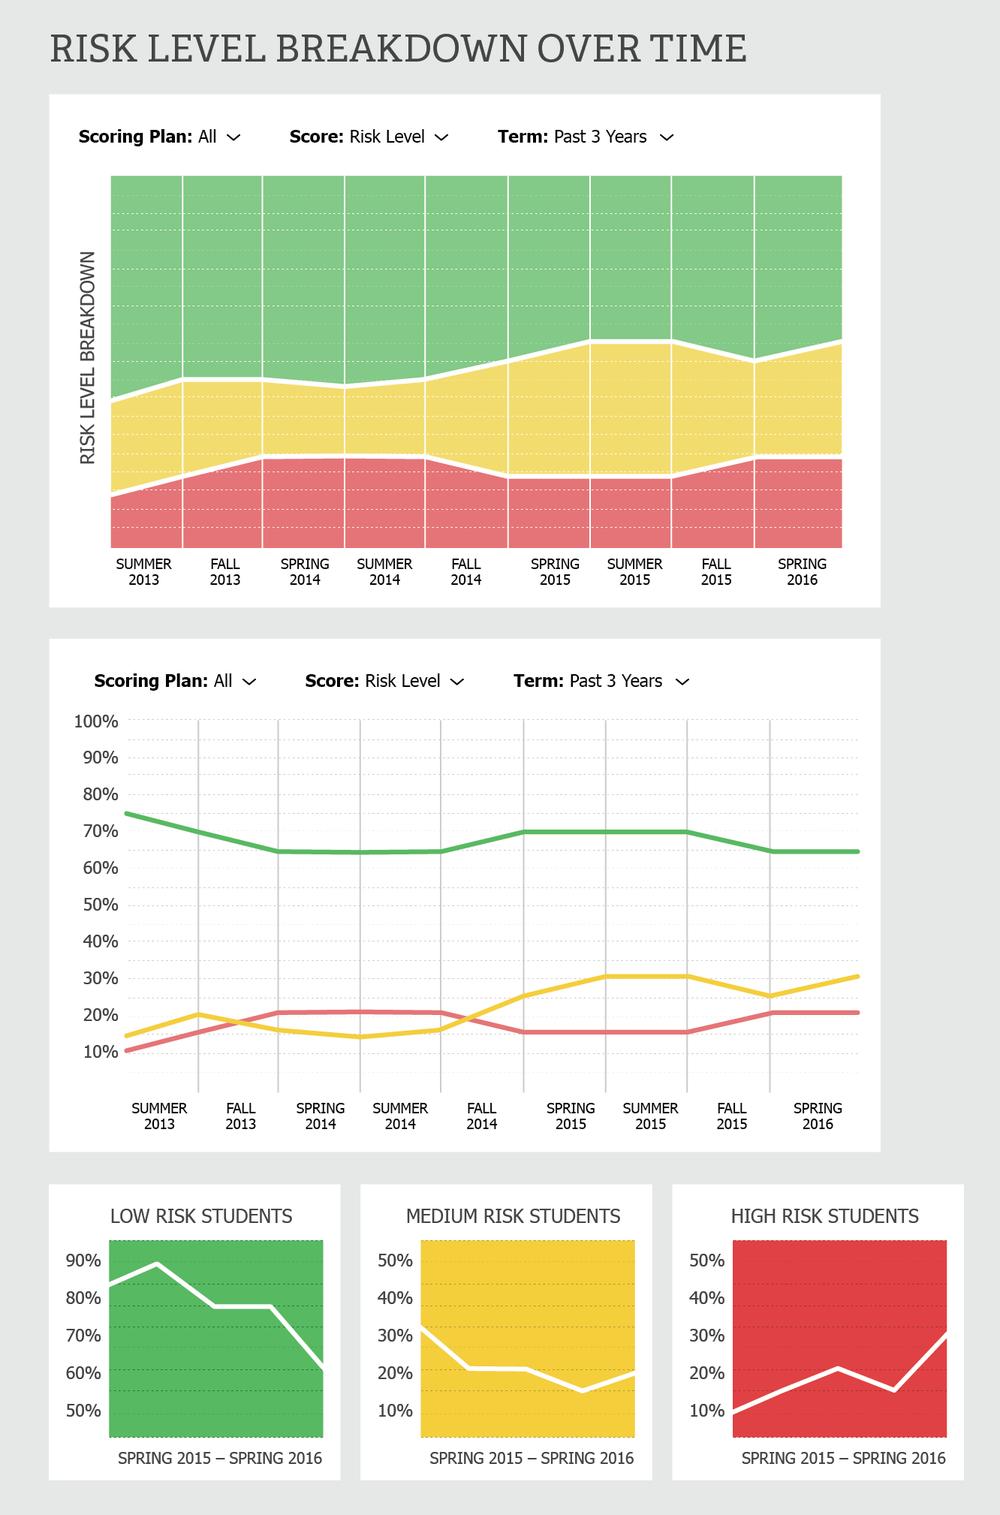 Graphs_V2_Risk Level Breakdown - Over Time.png